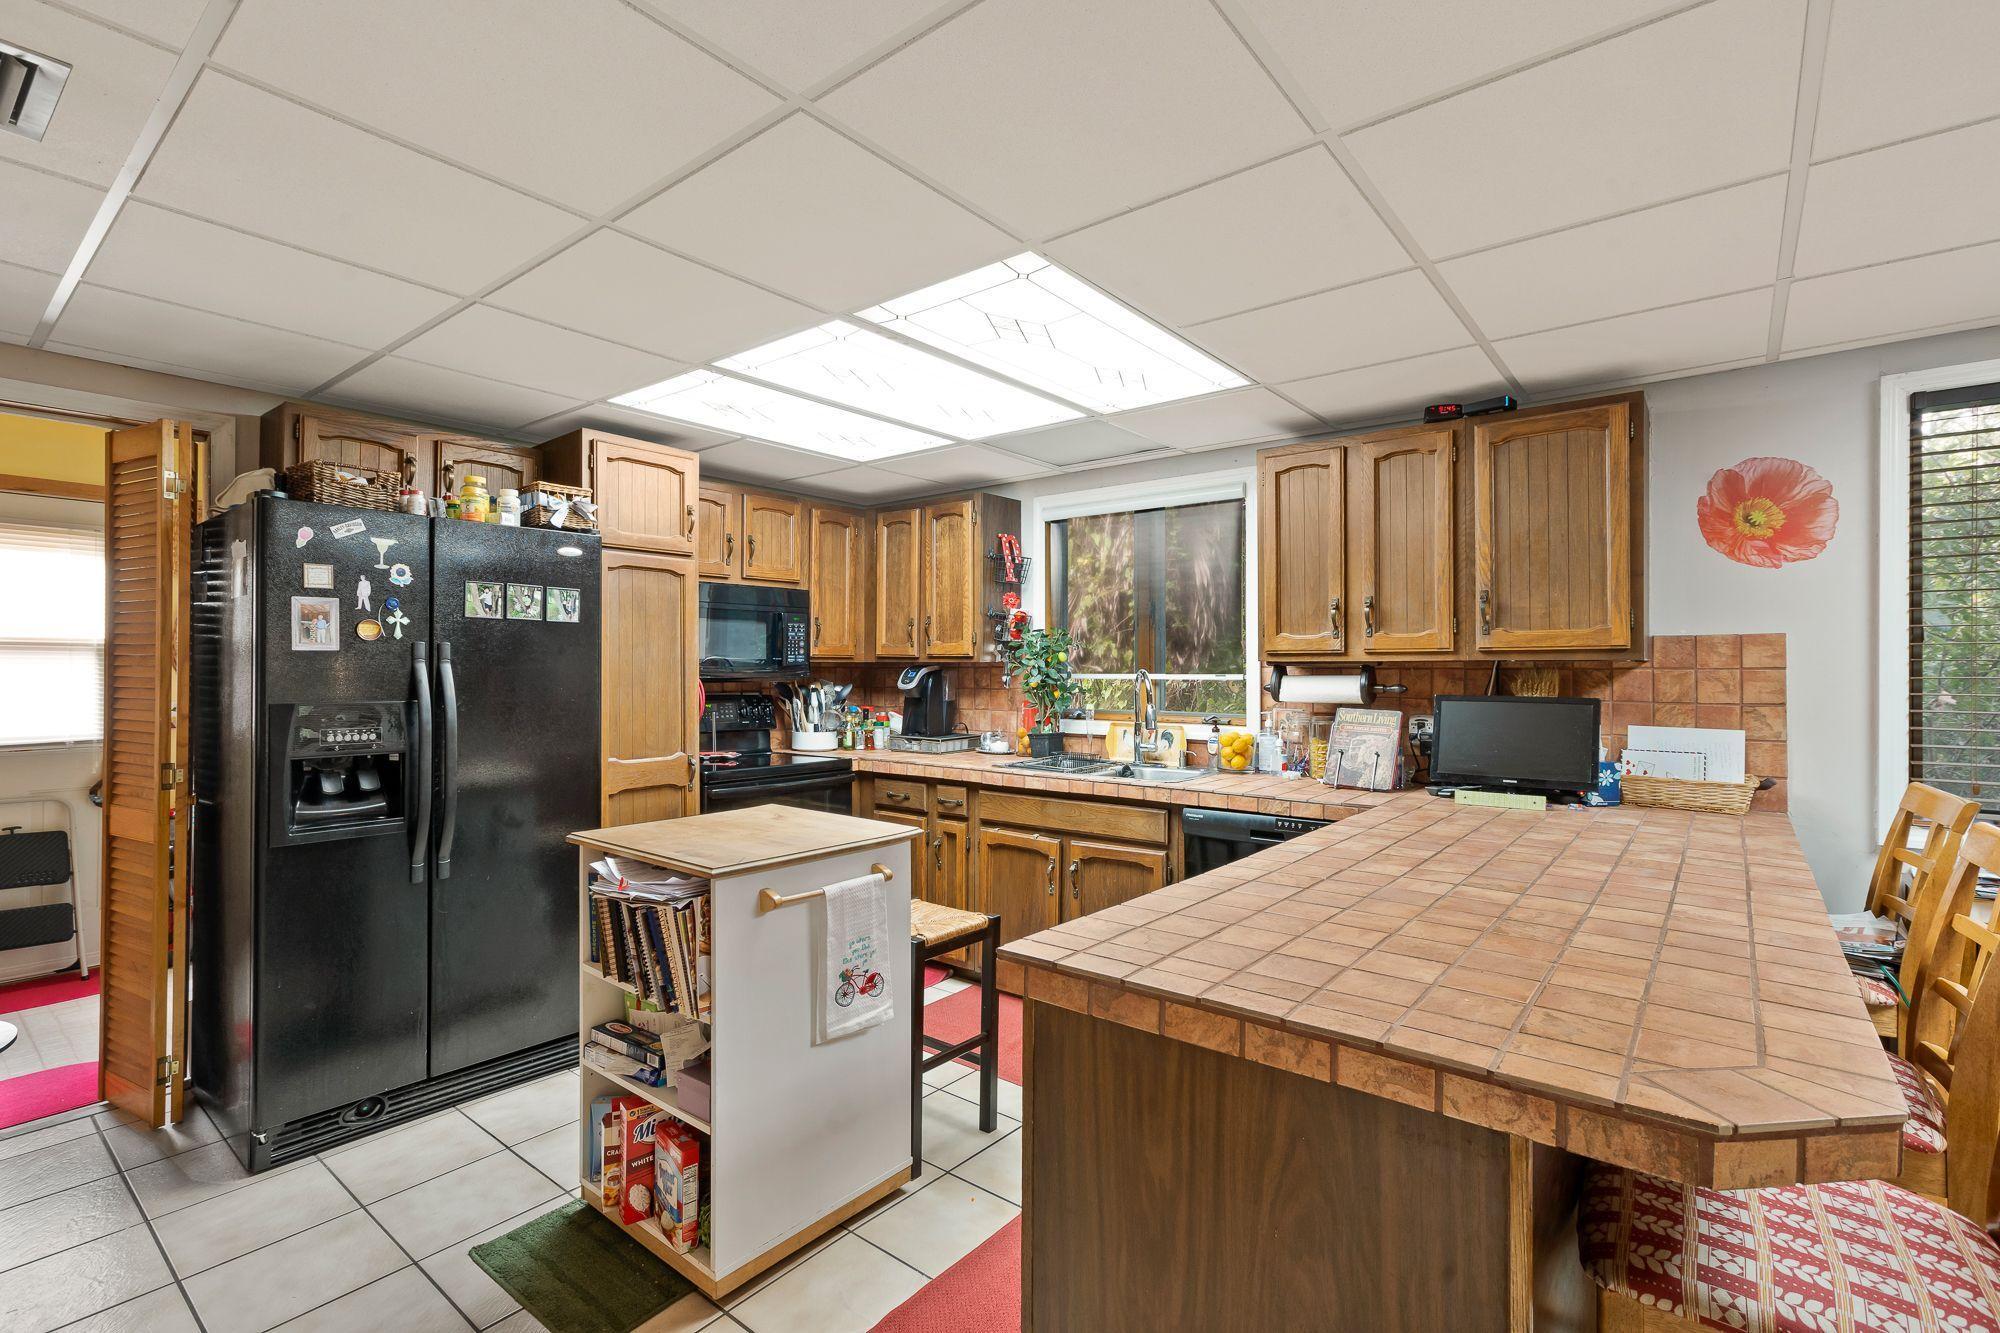 4201 Sunrise Boulevard, Fort Pierce, Florida 34982, 3 Bedrooms Bedrooms, ,2 BathroomsBathrooms,Residential,For Sale,Sunrise,RX-10694588